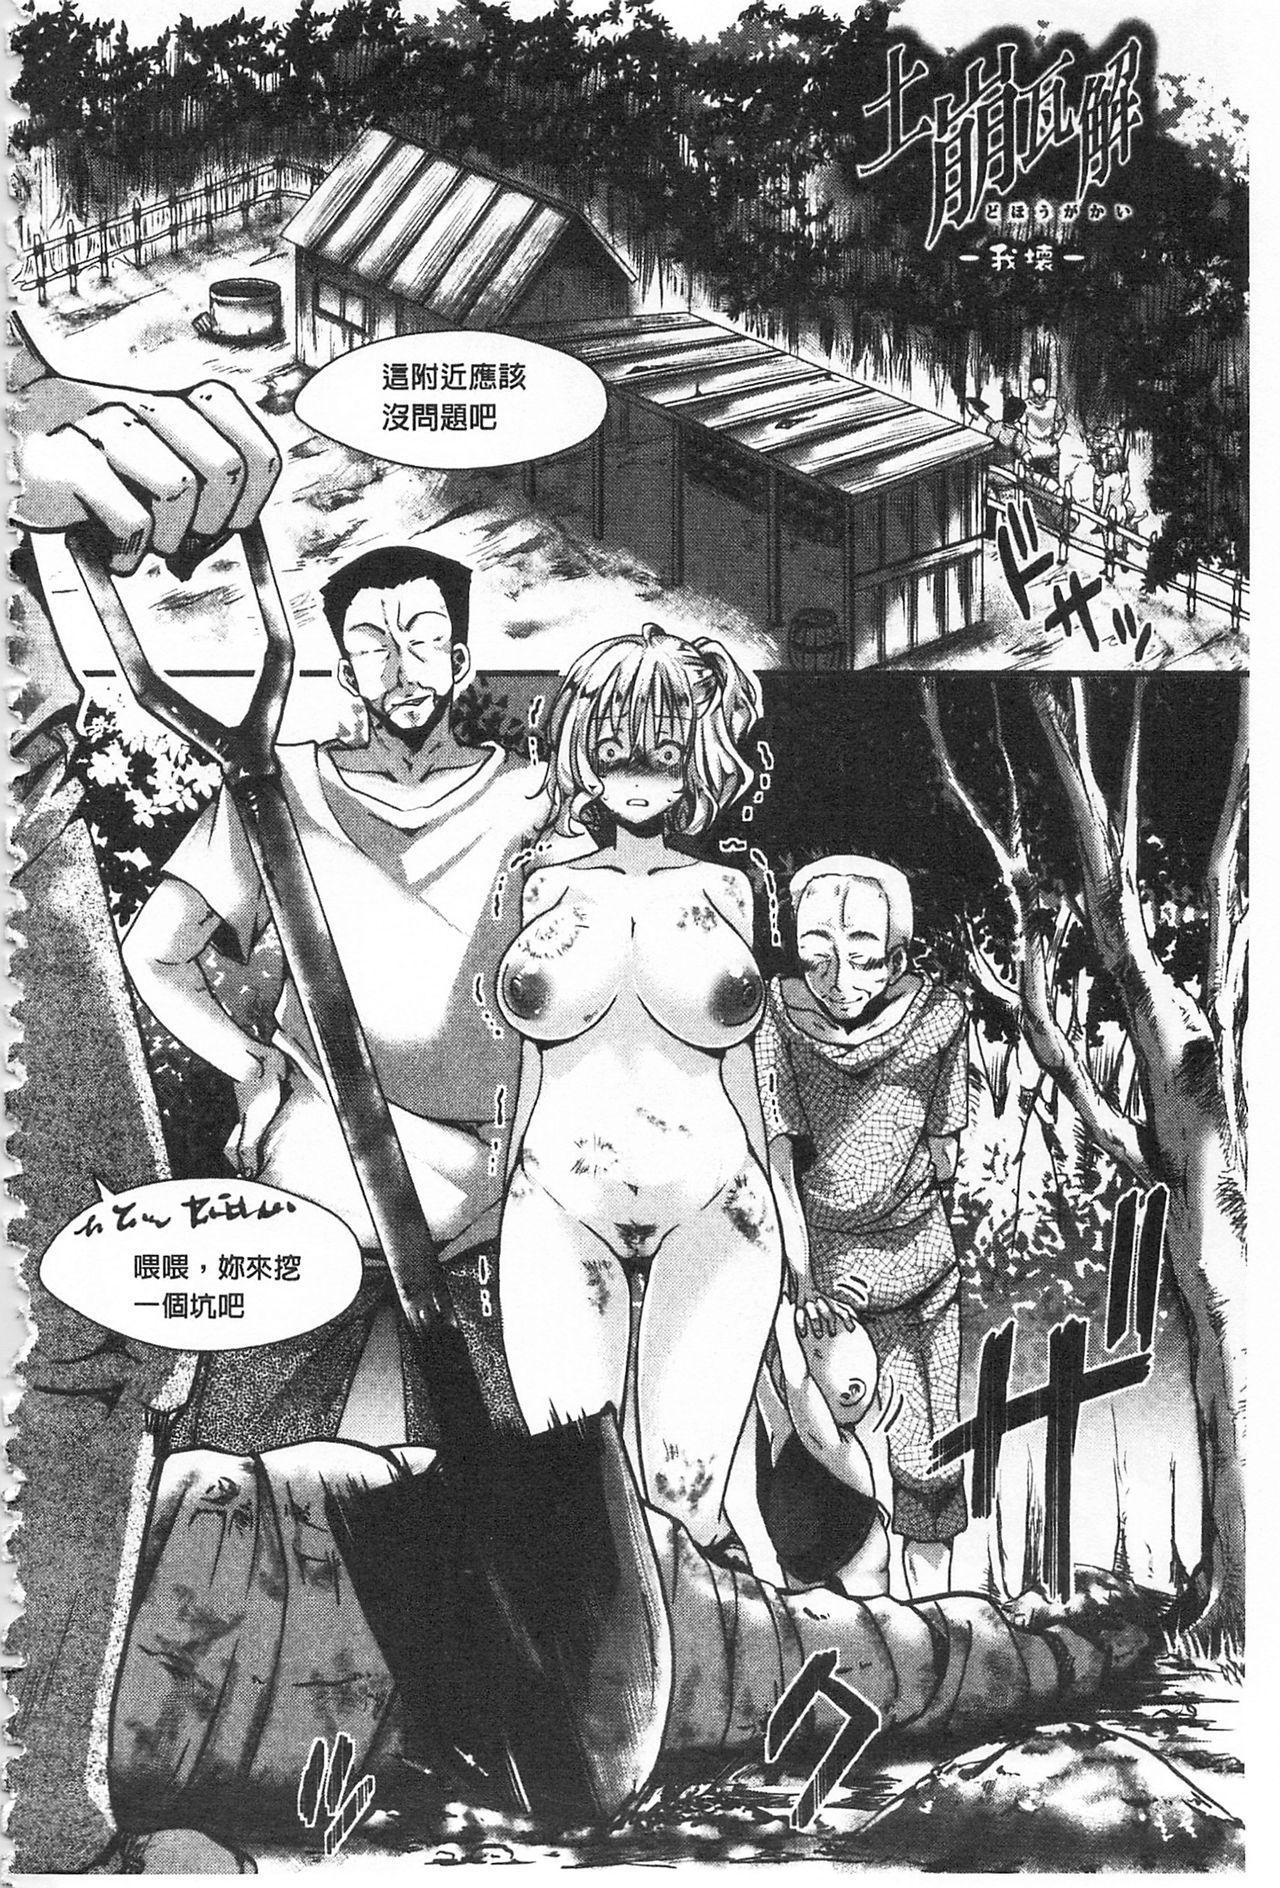 [hal] Daienjou -Ikare Ikasare Iki Ikare-   ∞艶嬢 -洩出來被搞到洩掛了被搞掛-  [Chinese] 103